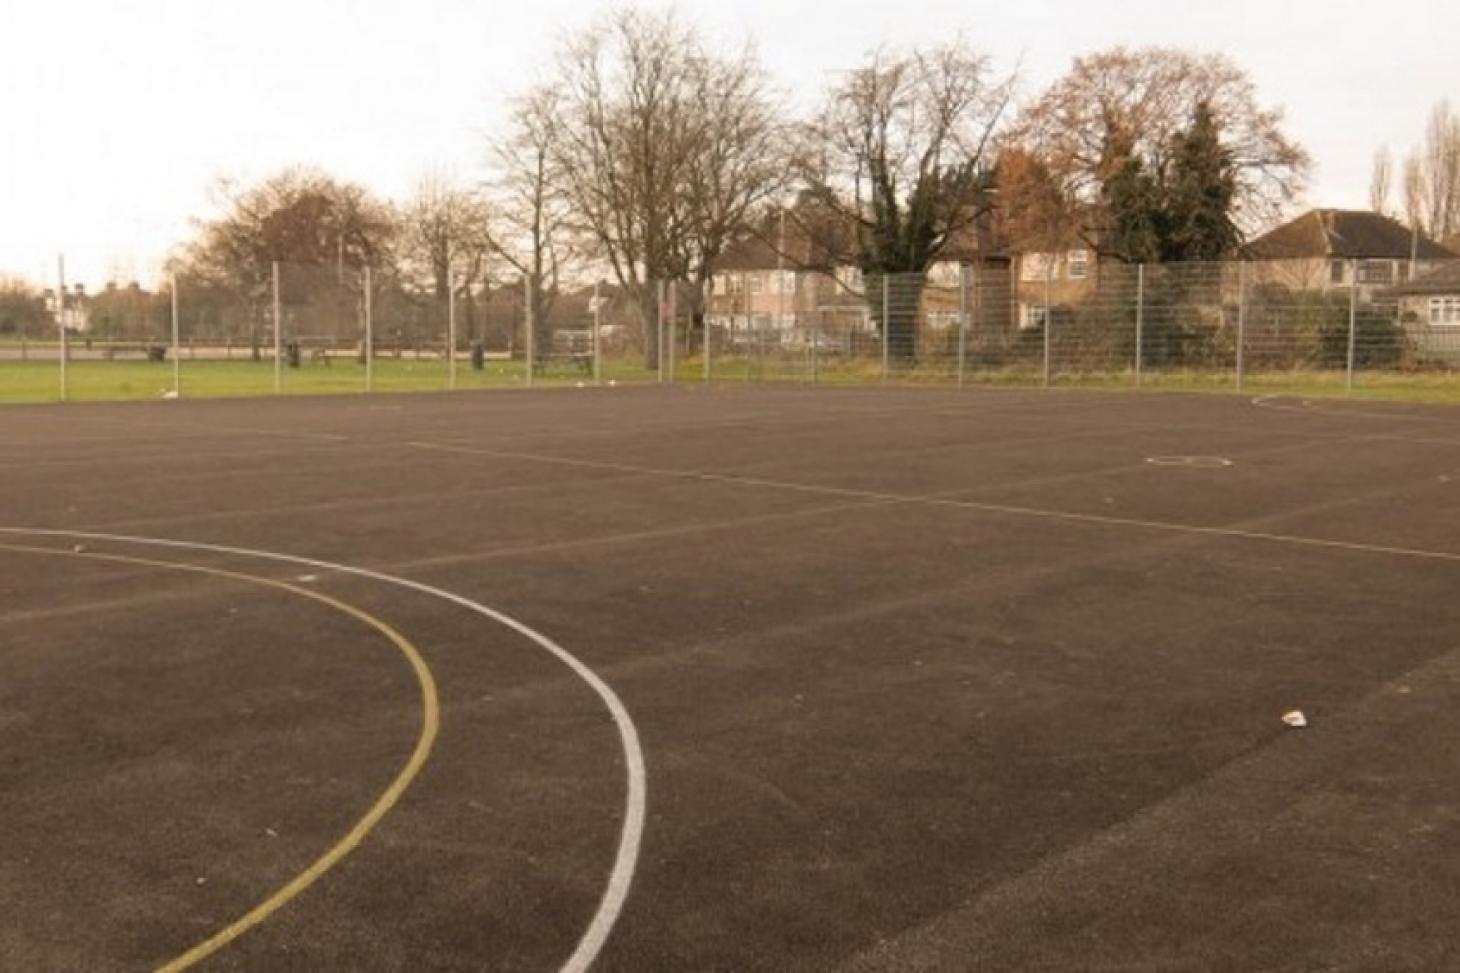 Harris Academy Rainham Outdoor | Hard (macadam) basketball court